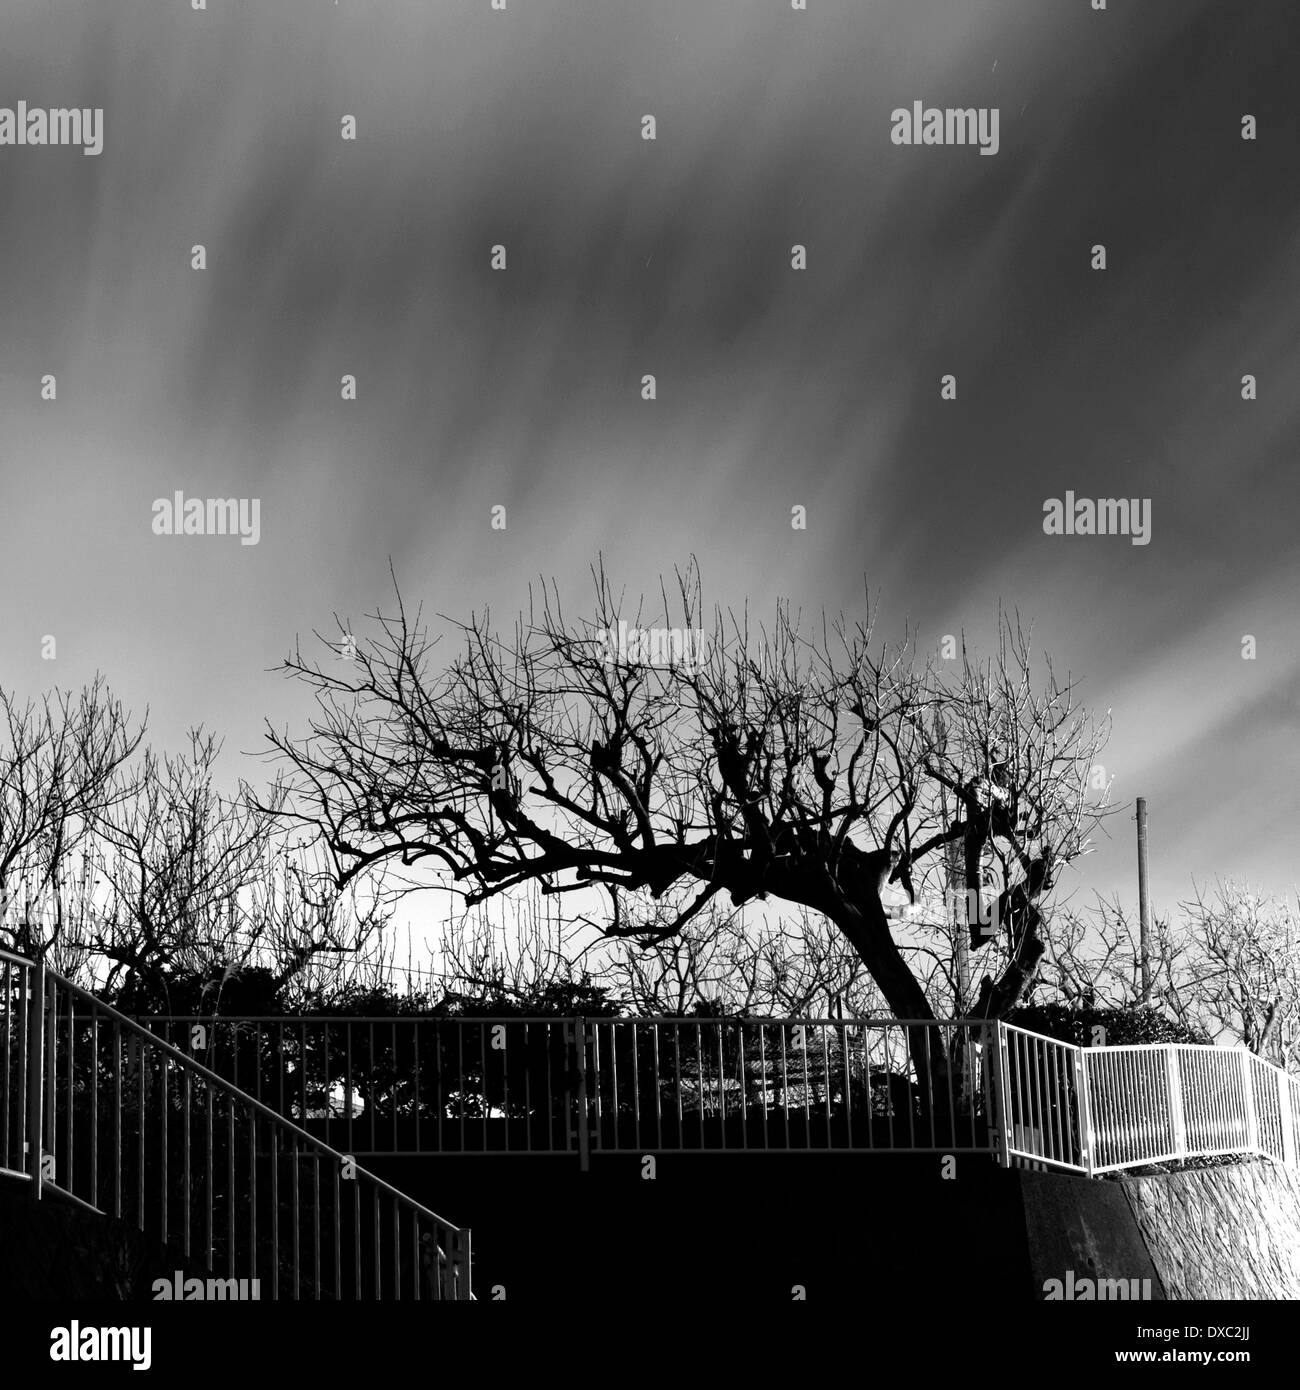 Tree in Yamato, Kanagawa Prefecture, Japan - Stock Image